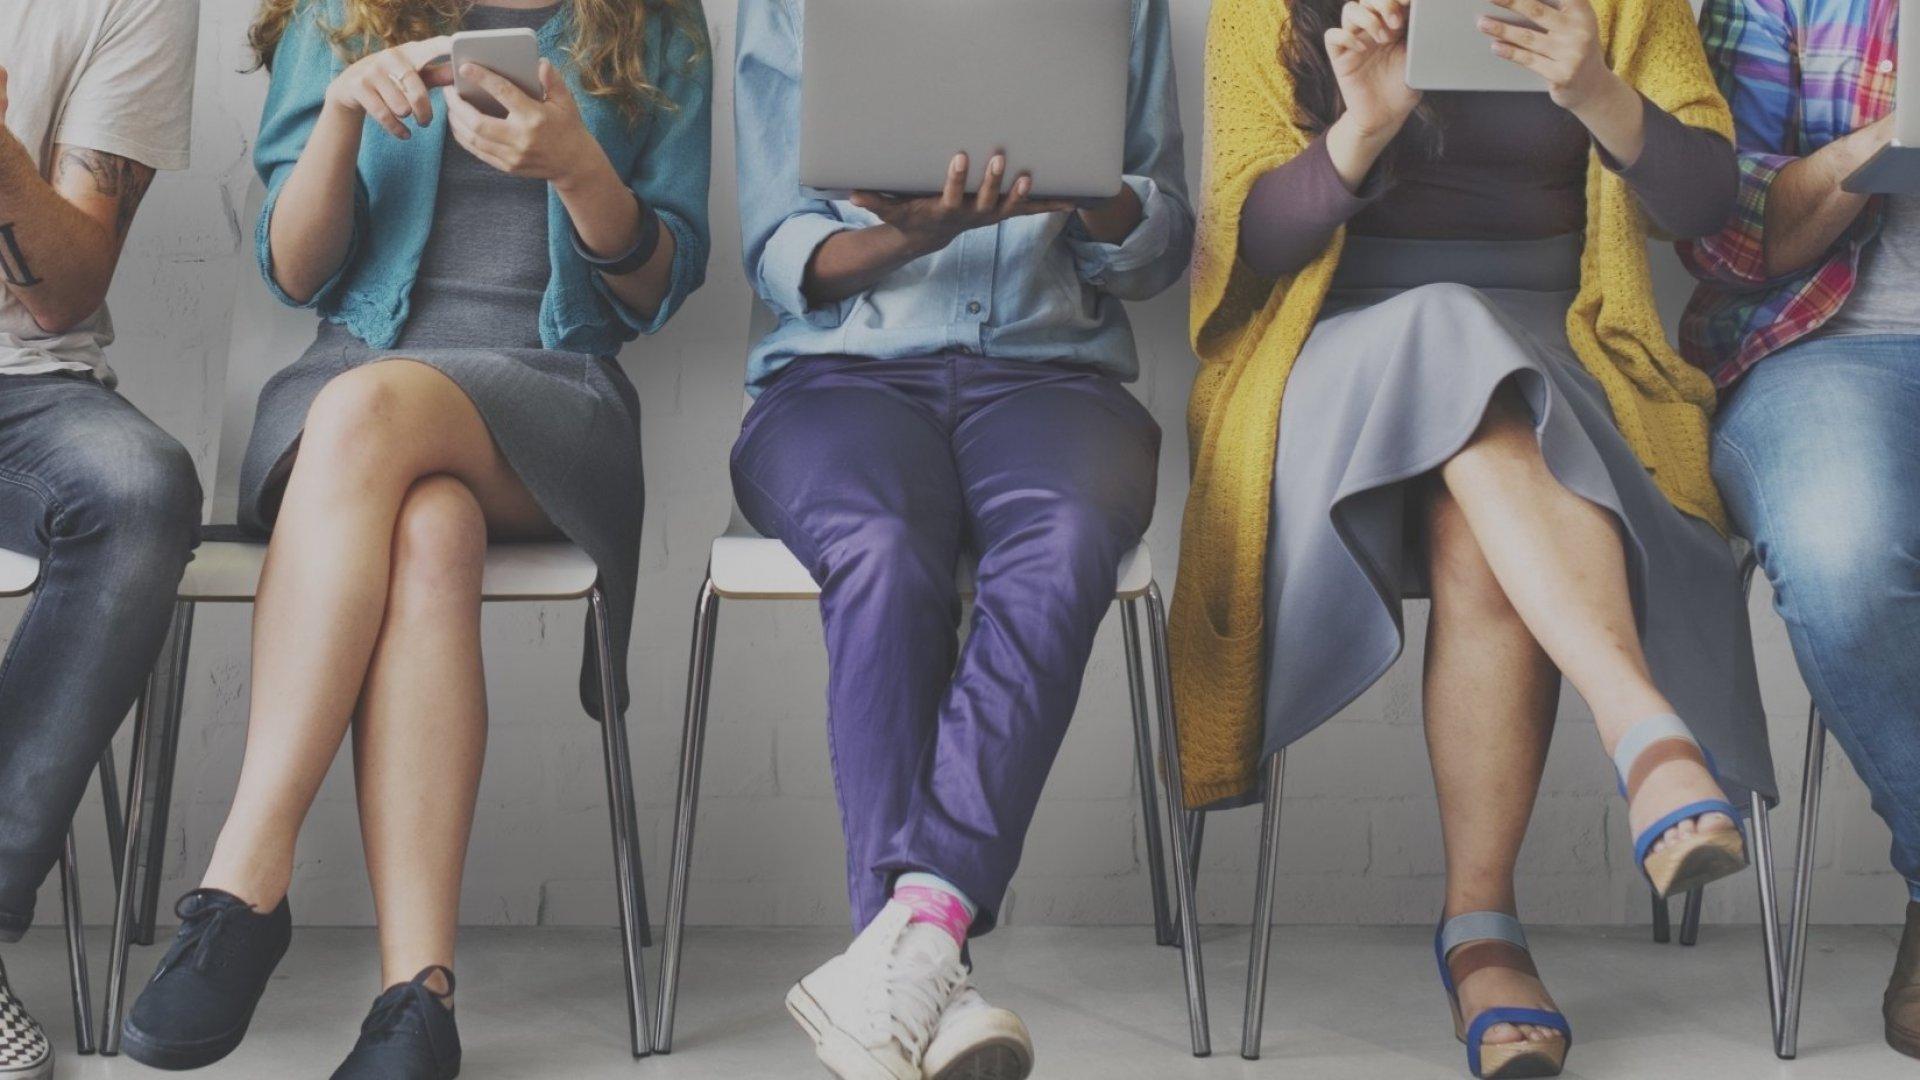 4 Ways Millennials Can Improve Their Communication Skills